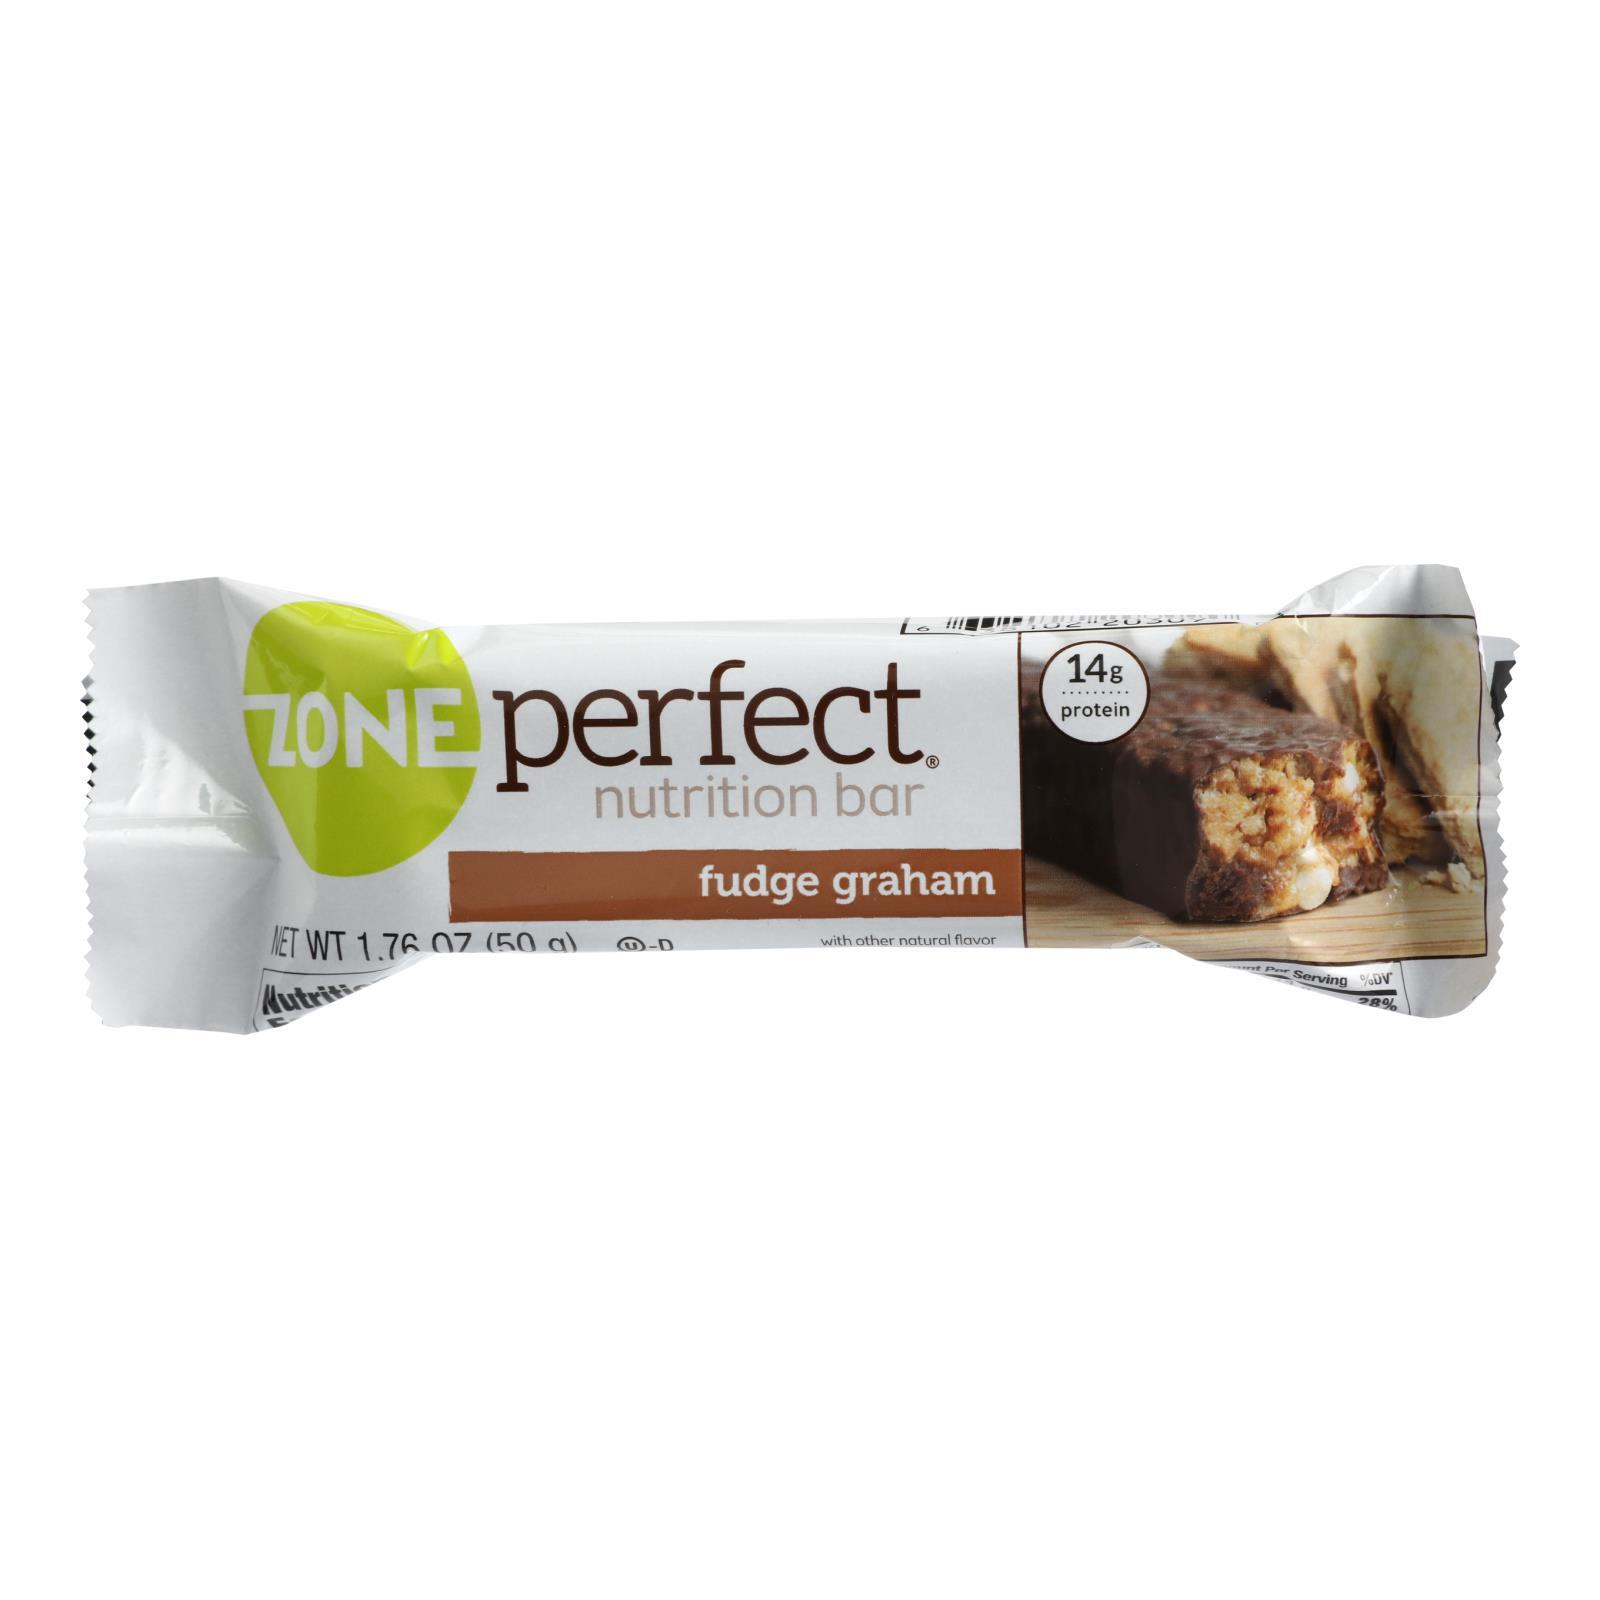 Zone Nutrition Bar - Fudge Graham - Case of 12 - 1.76 oz